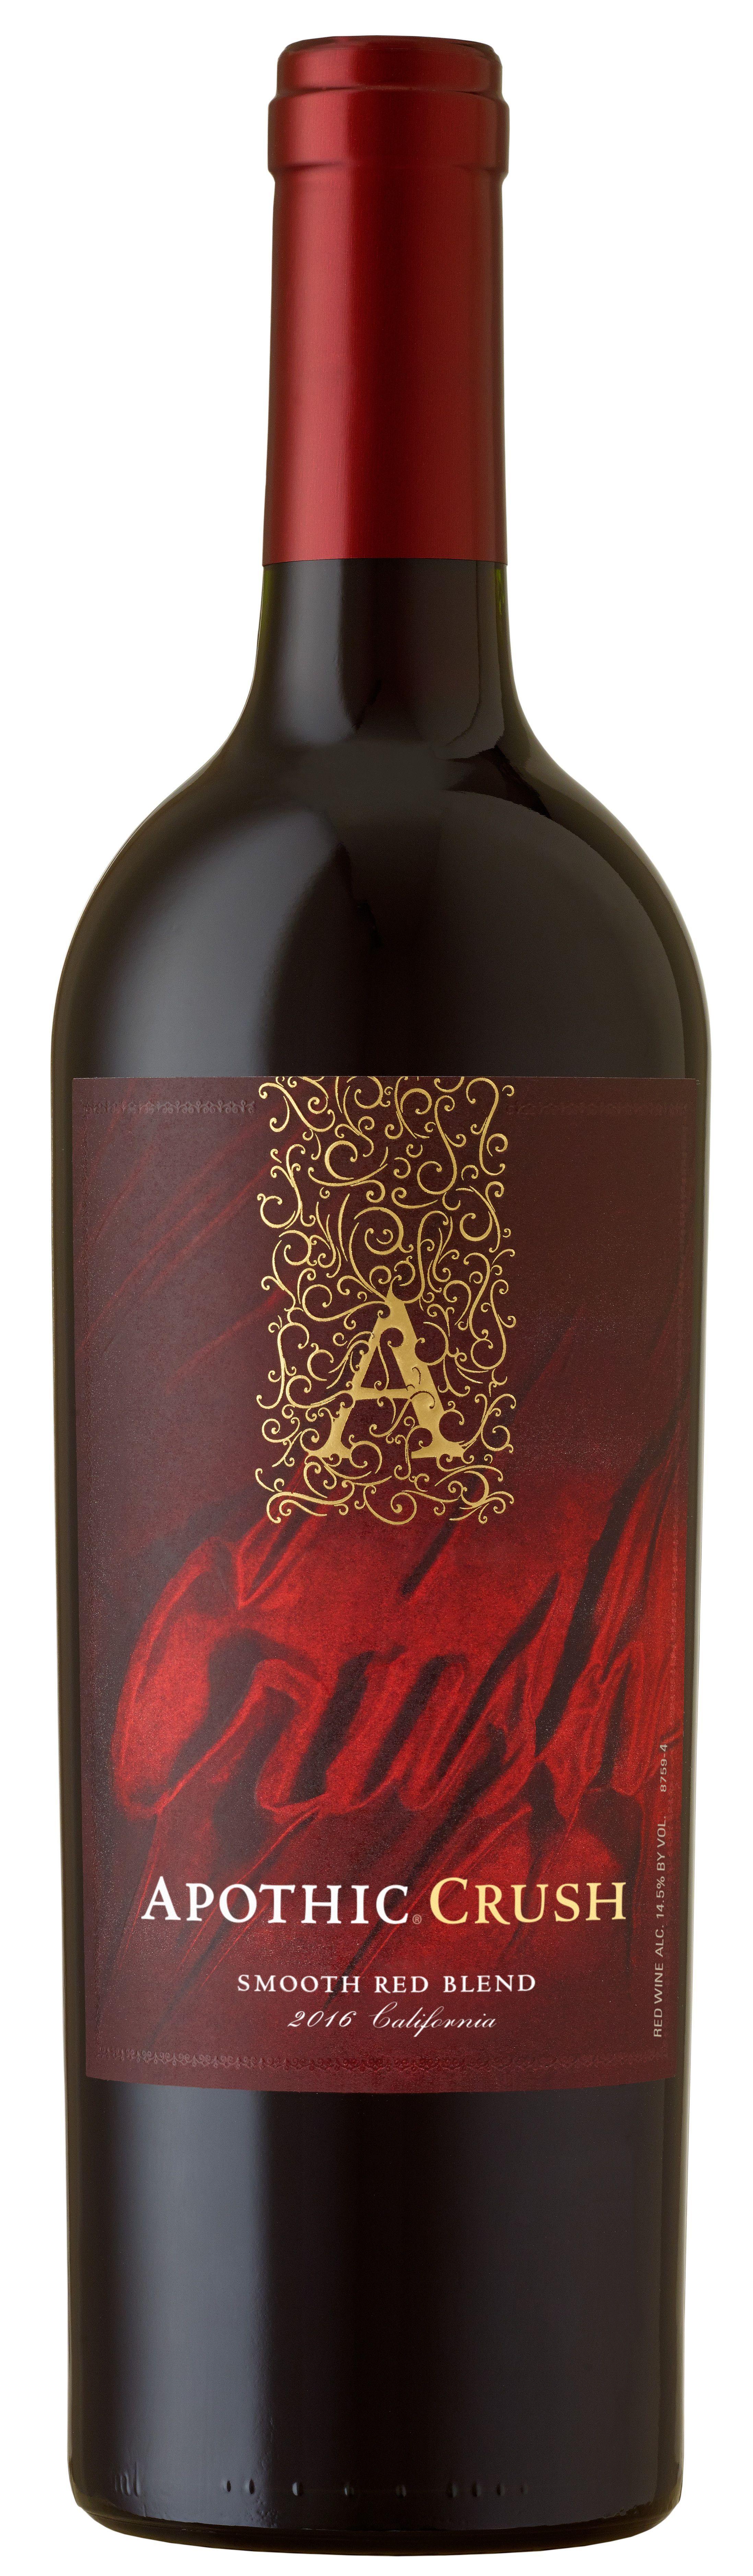 Level Up 15 Cheap Wines That Taste Expensive Etiquetas De Vino Tiempo De Vino Vinos